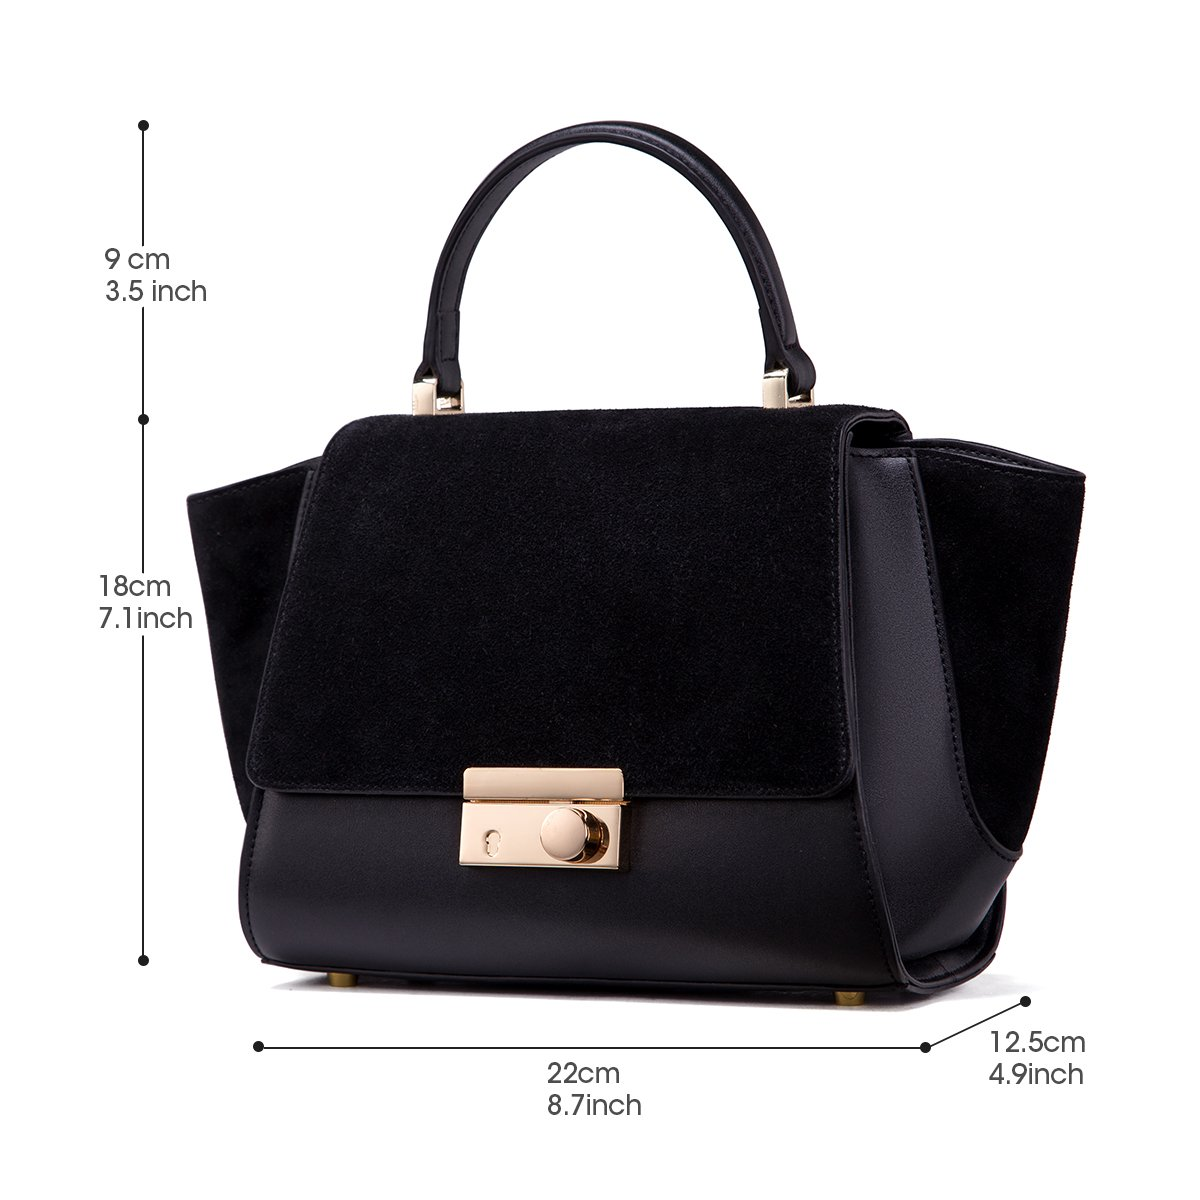 8d199eb8a0 Ladies Black Leather Handbags Designer Purses with Adjustable Shoulder  Strap  Handbags  Amazon.com